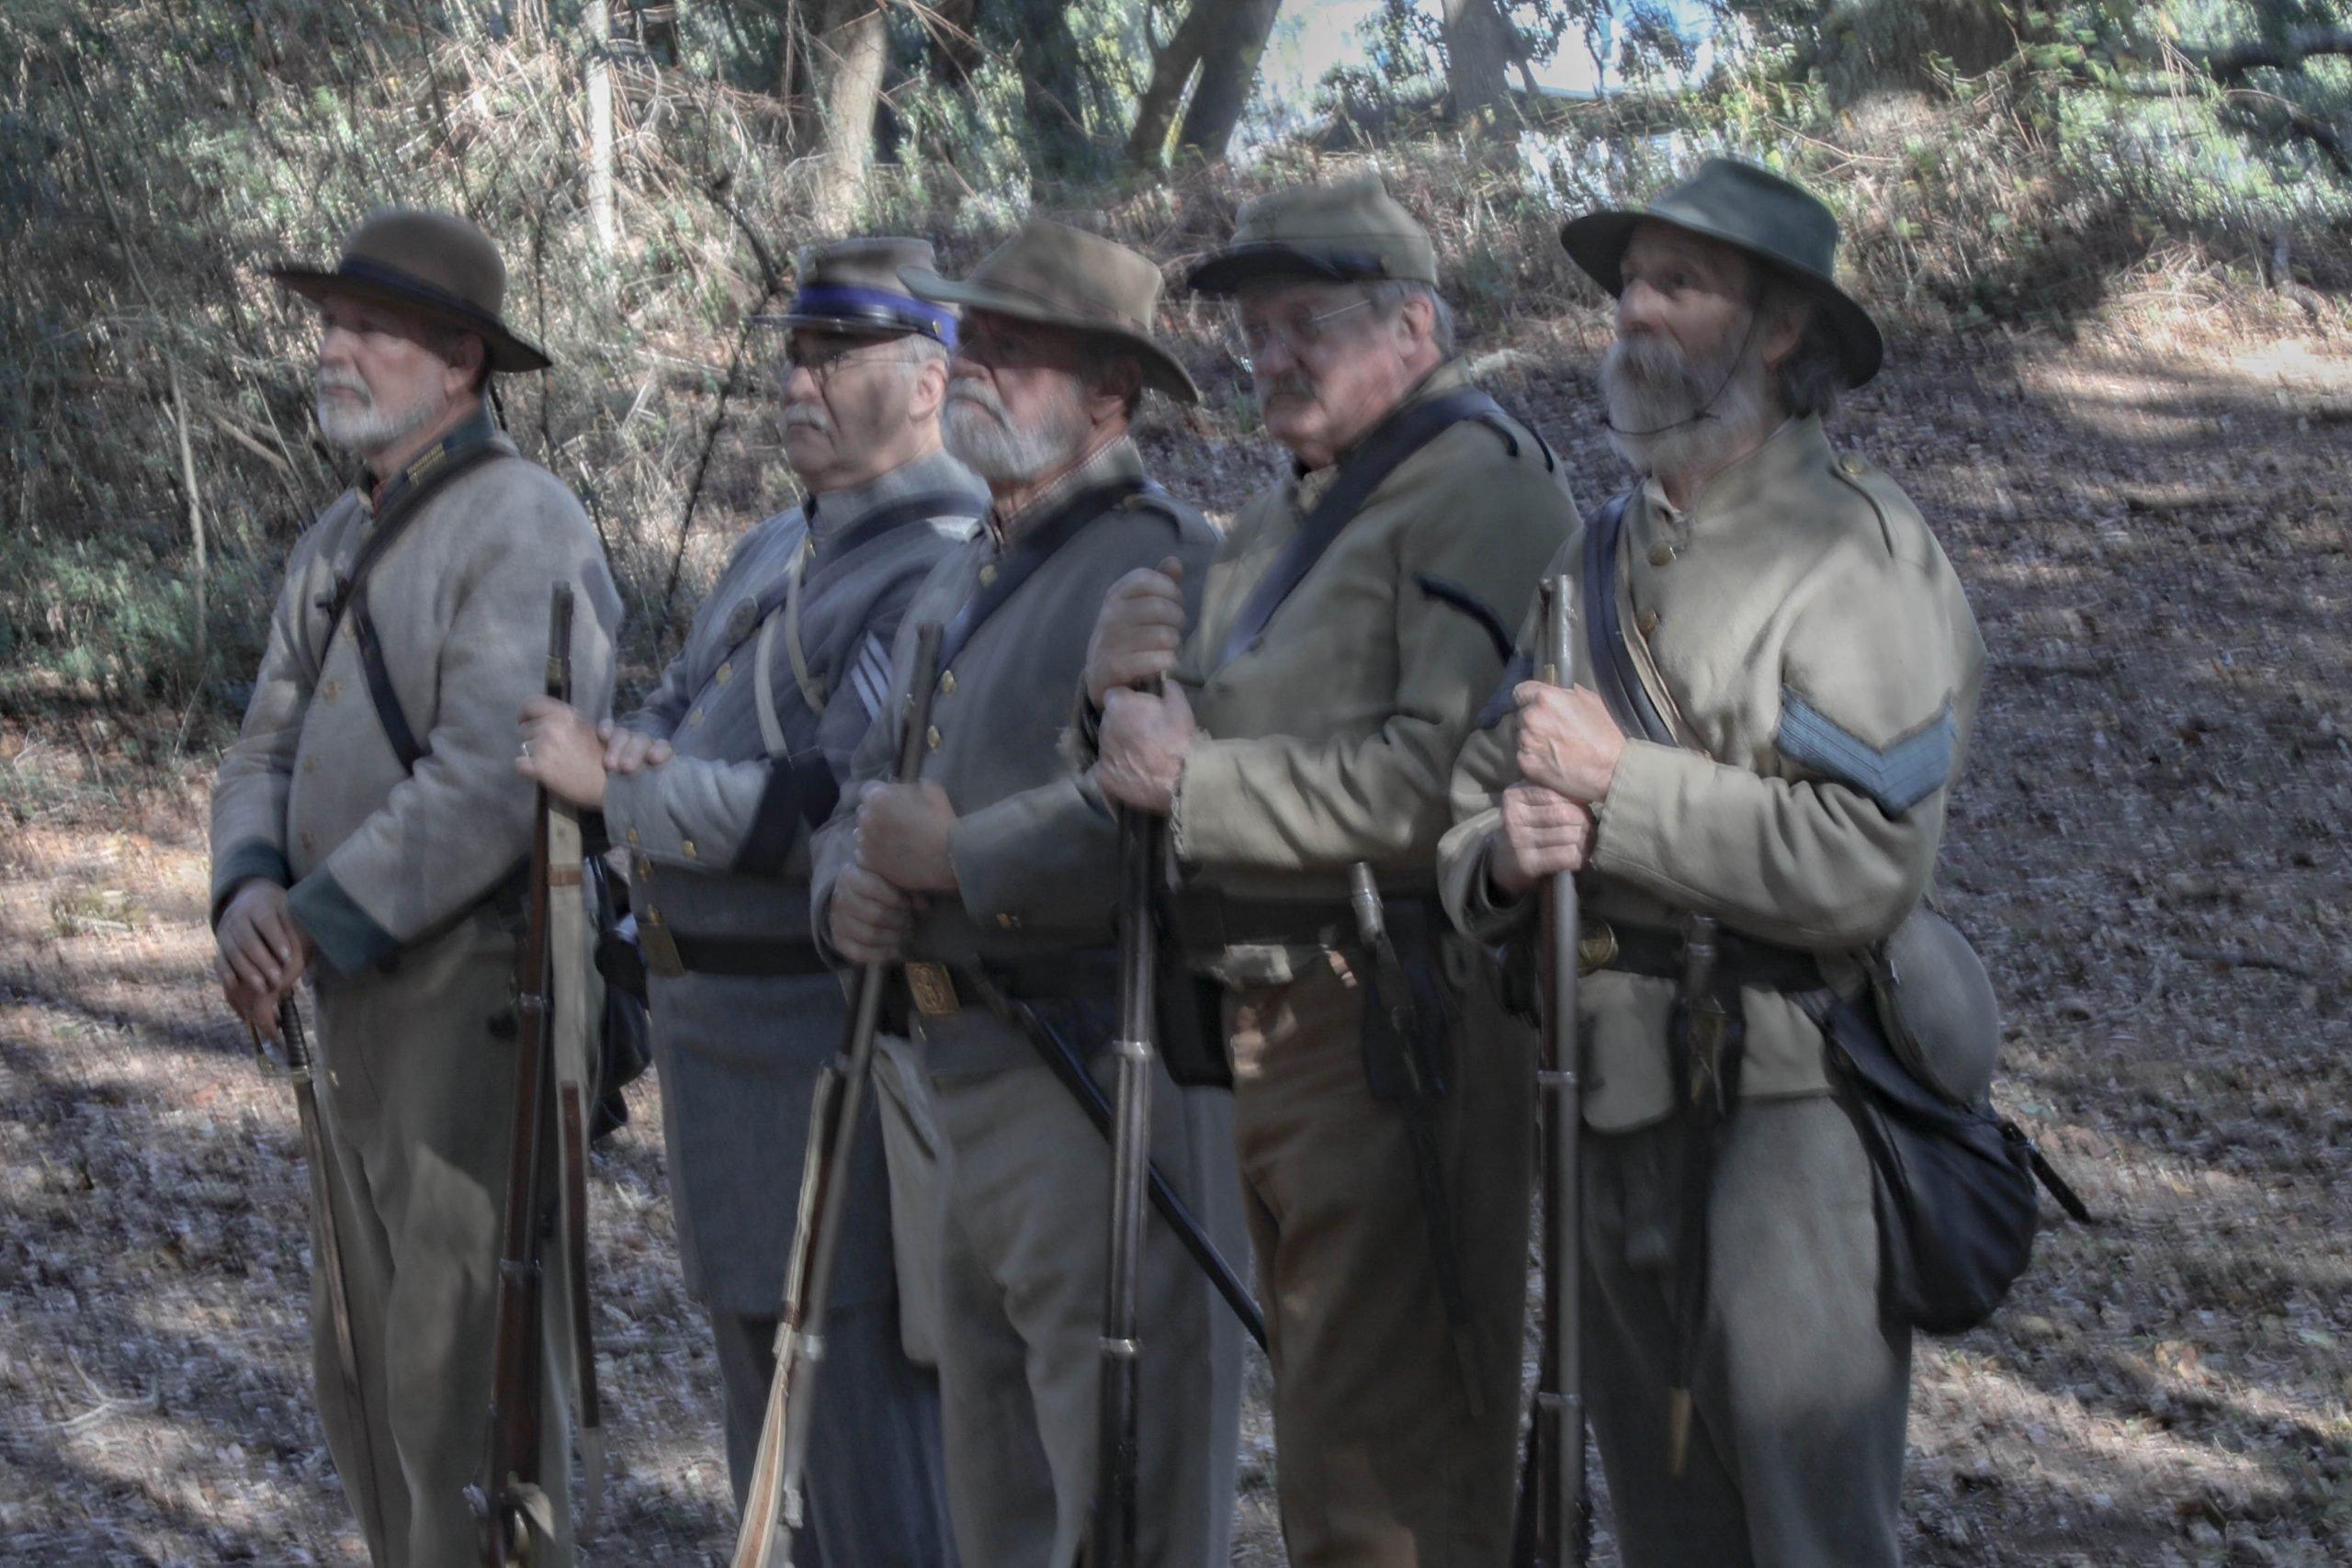 Sons of Confederate Veterans (20)